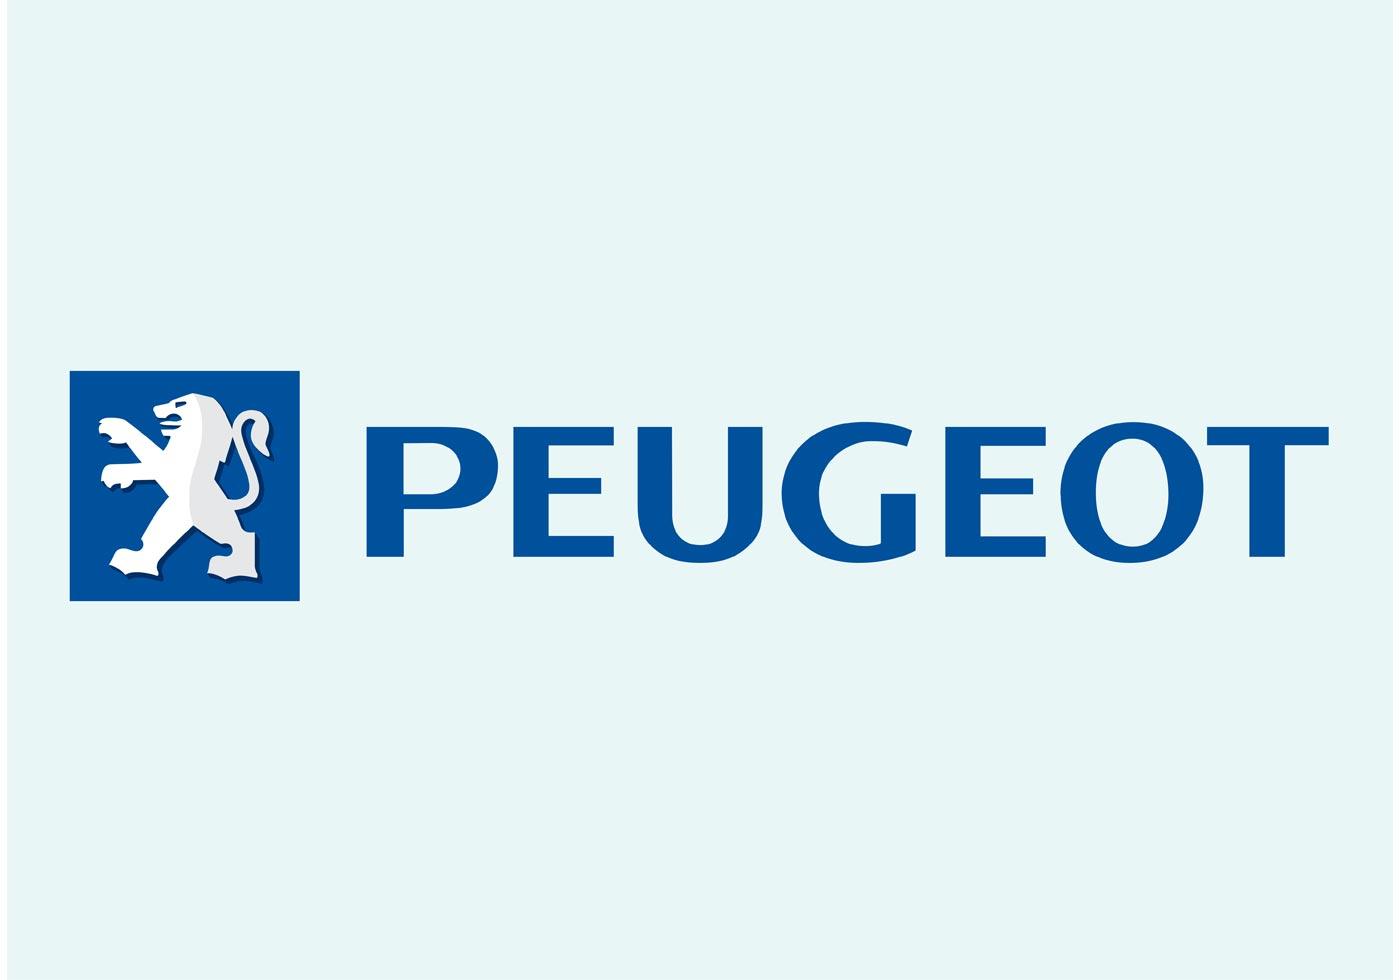 peugeot logo download free vector art stock graphics